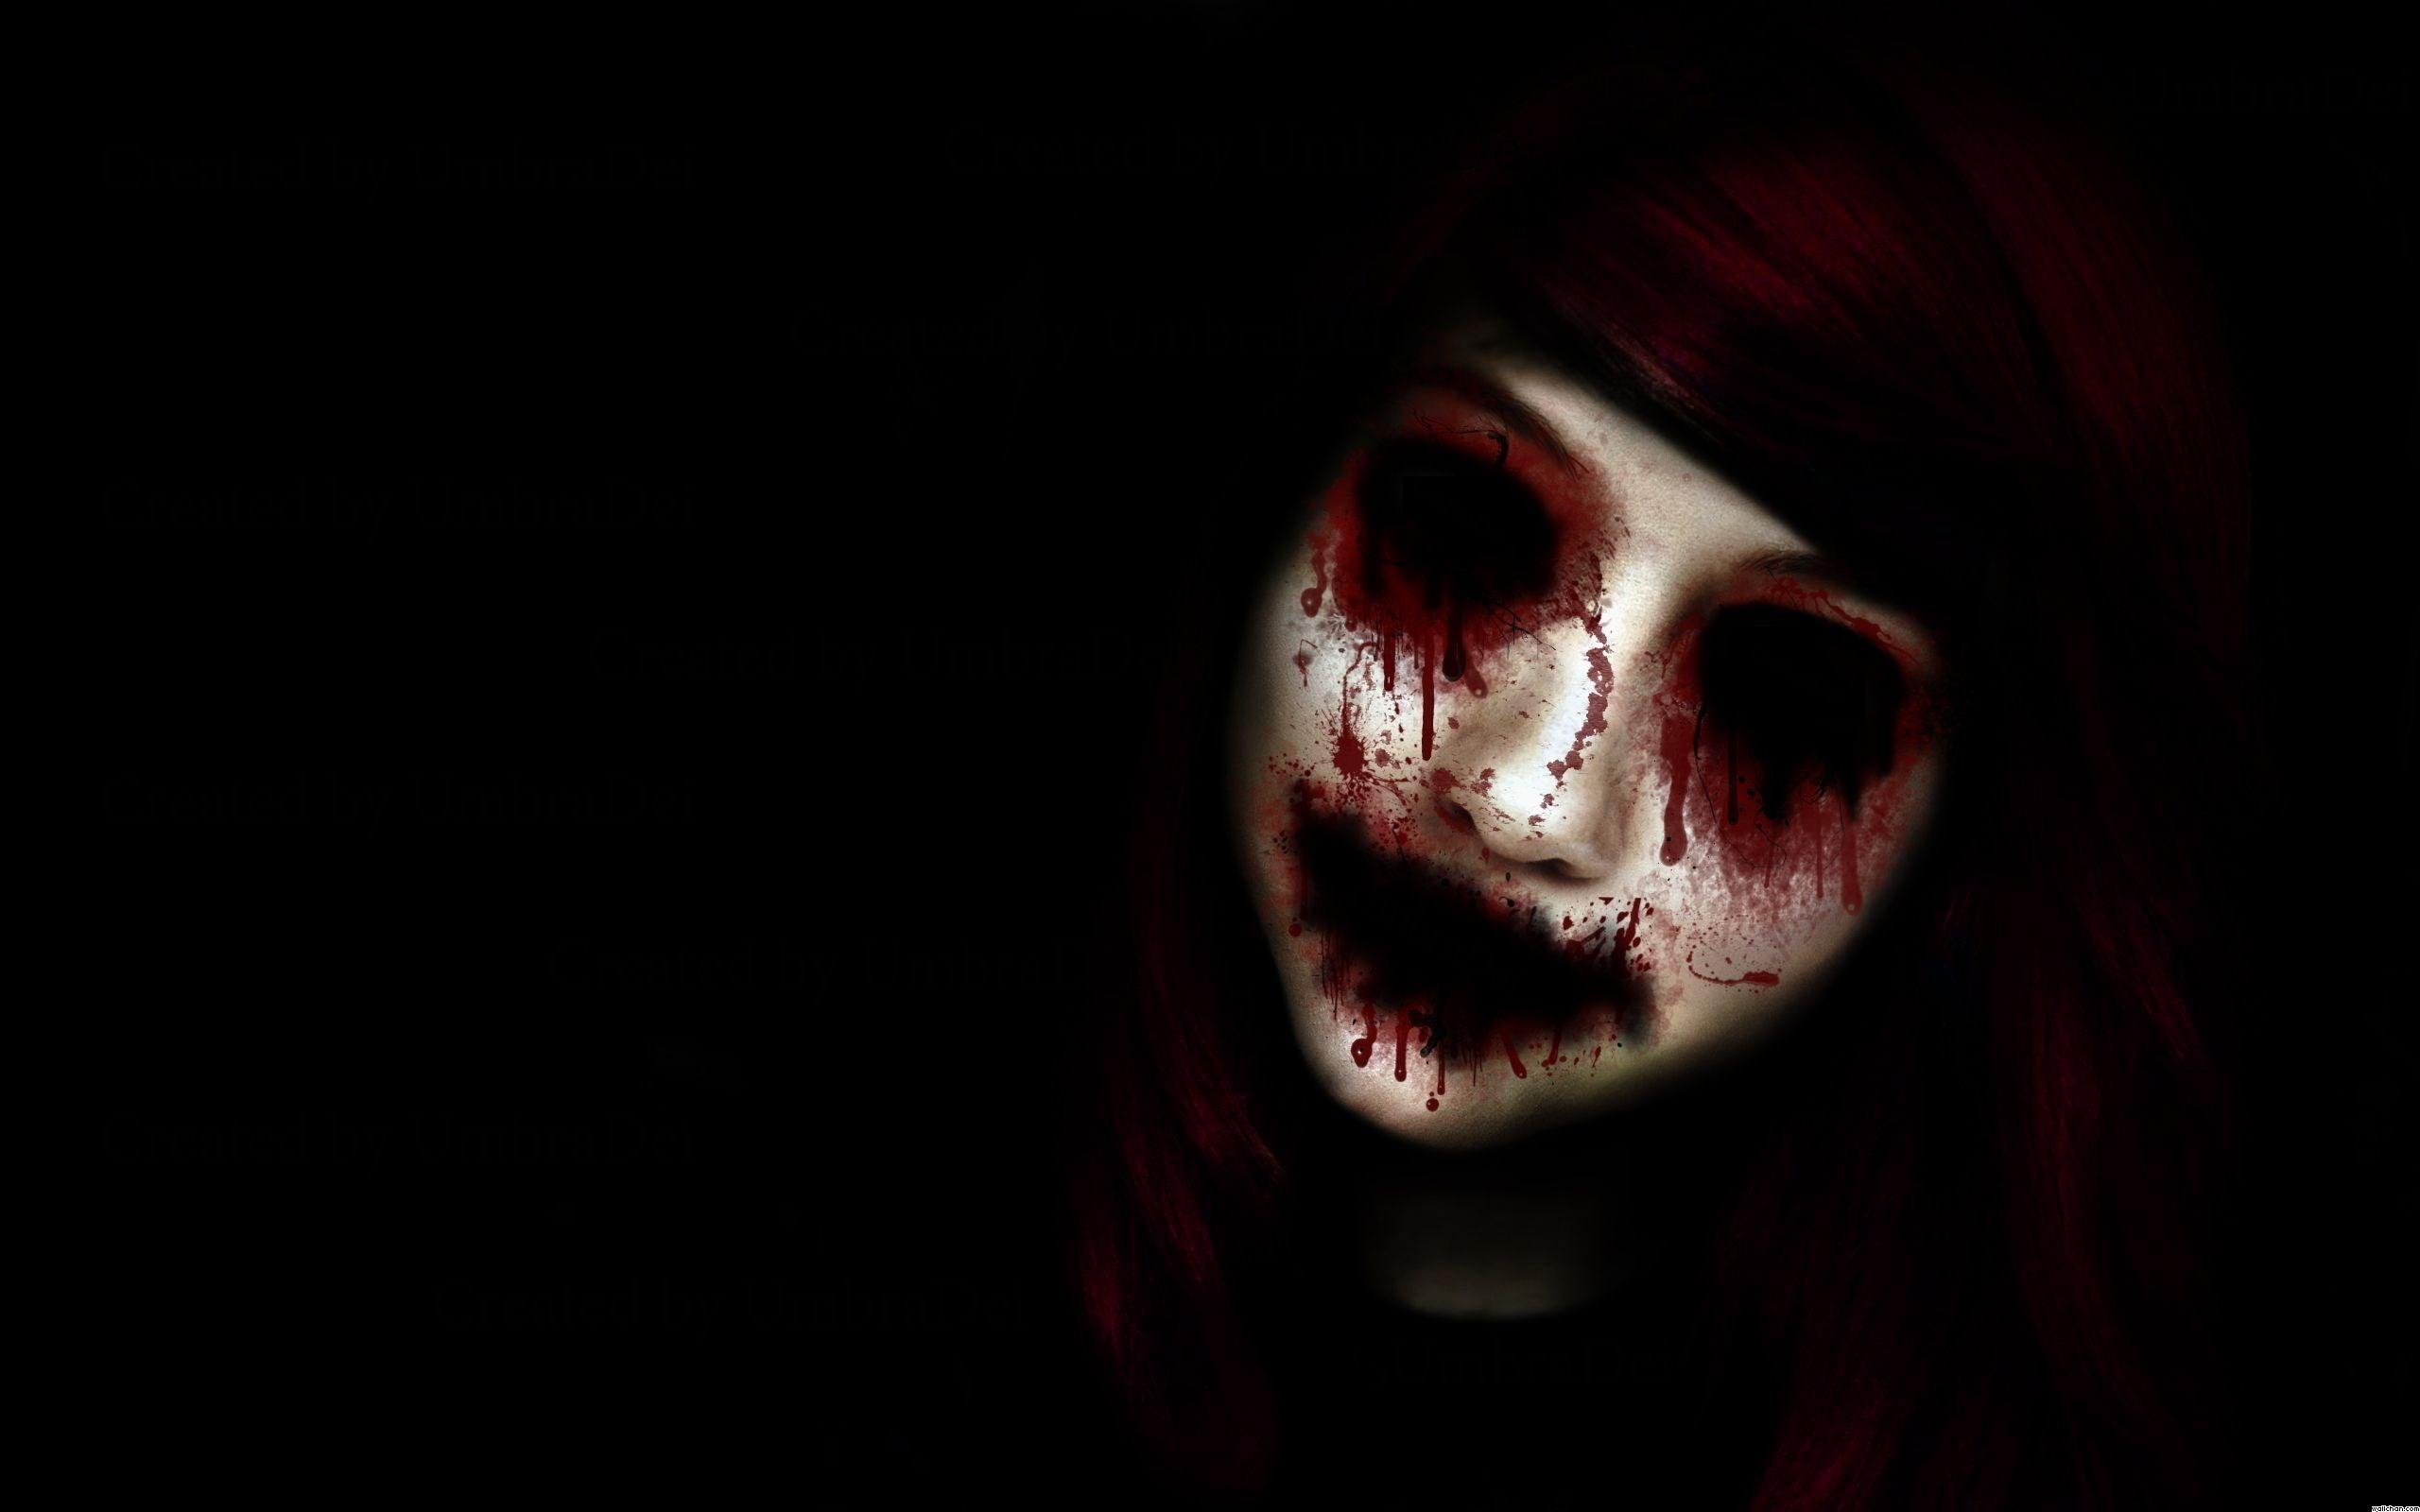 Creepy Hd Wallpaper: Scary Clown HD Wallpaper (73+ Images